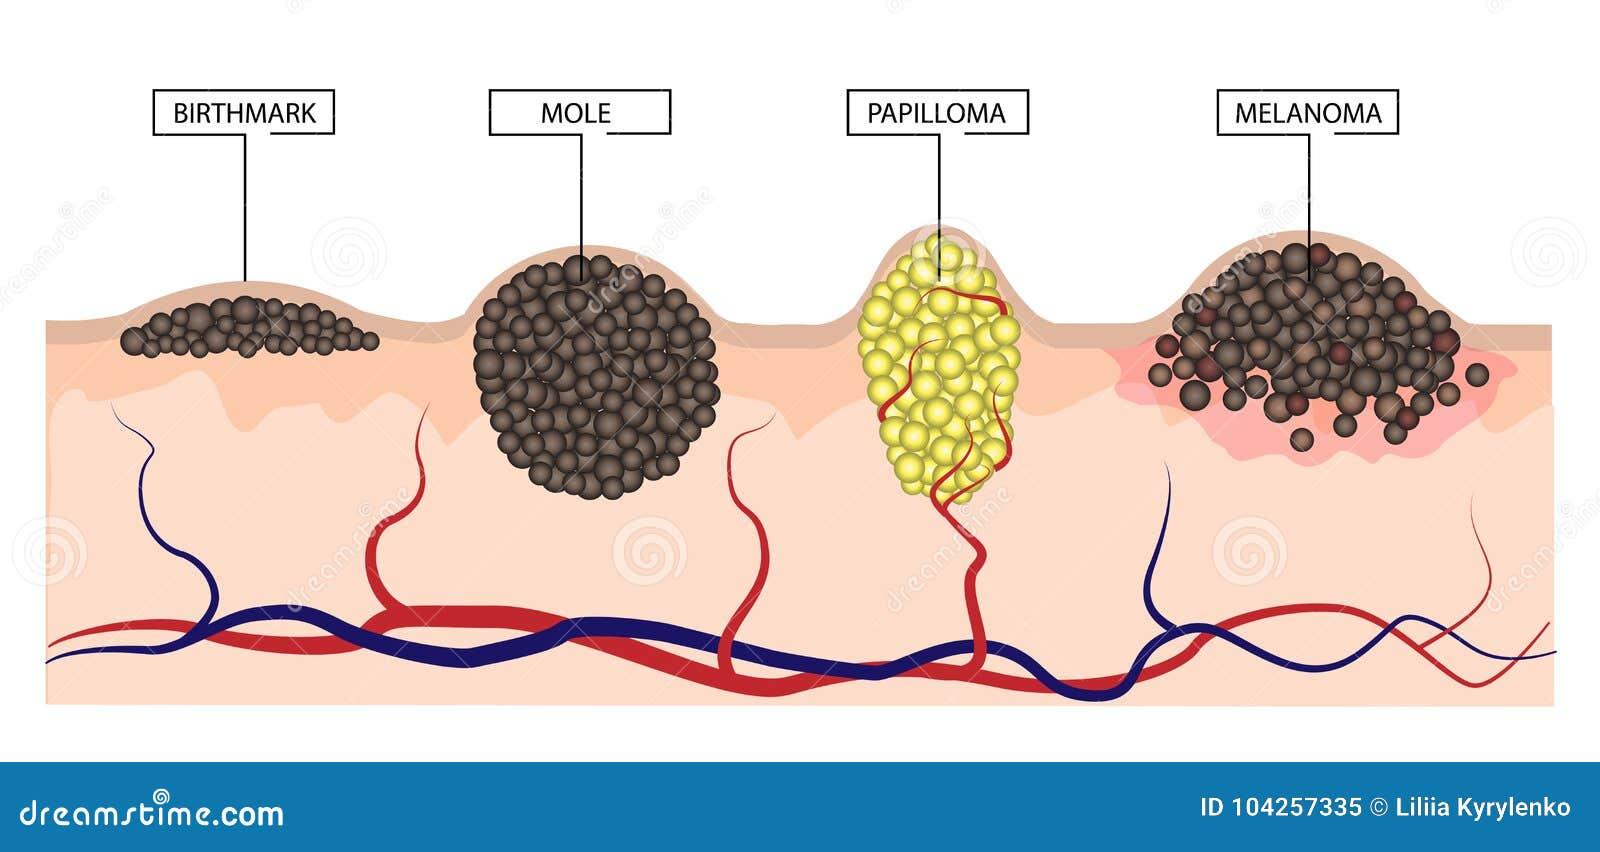 Papilloma and moles Hpv warts when pregnant